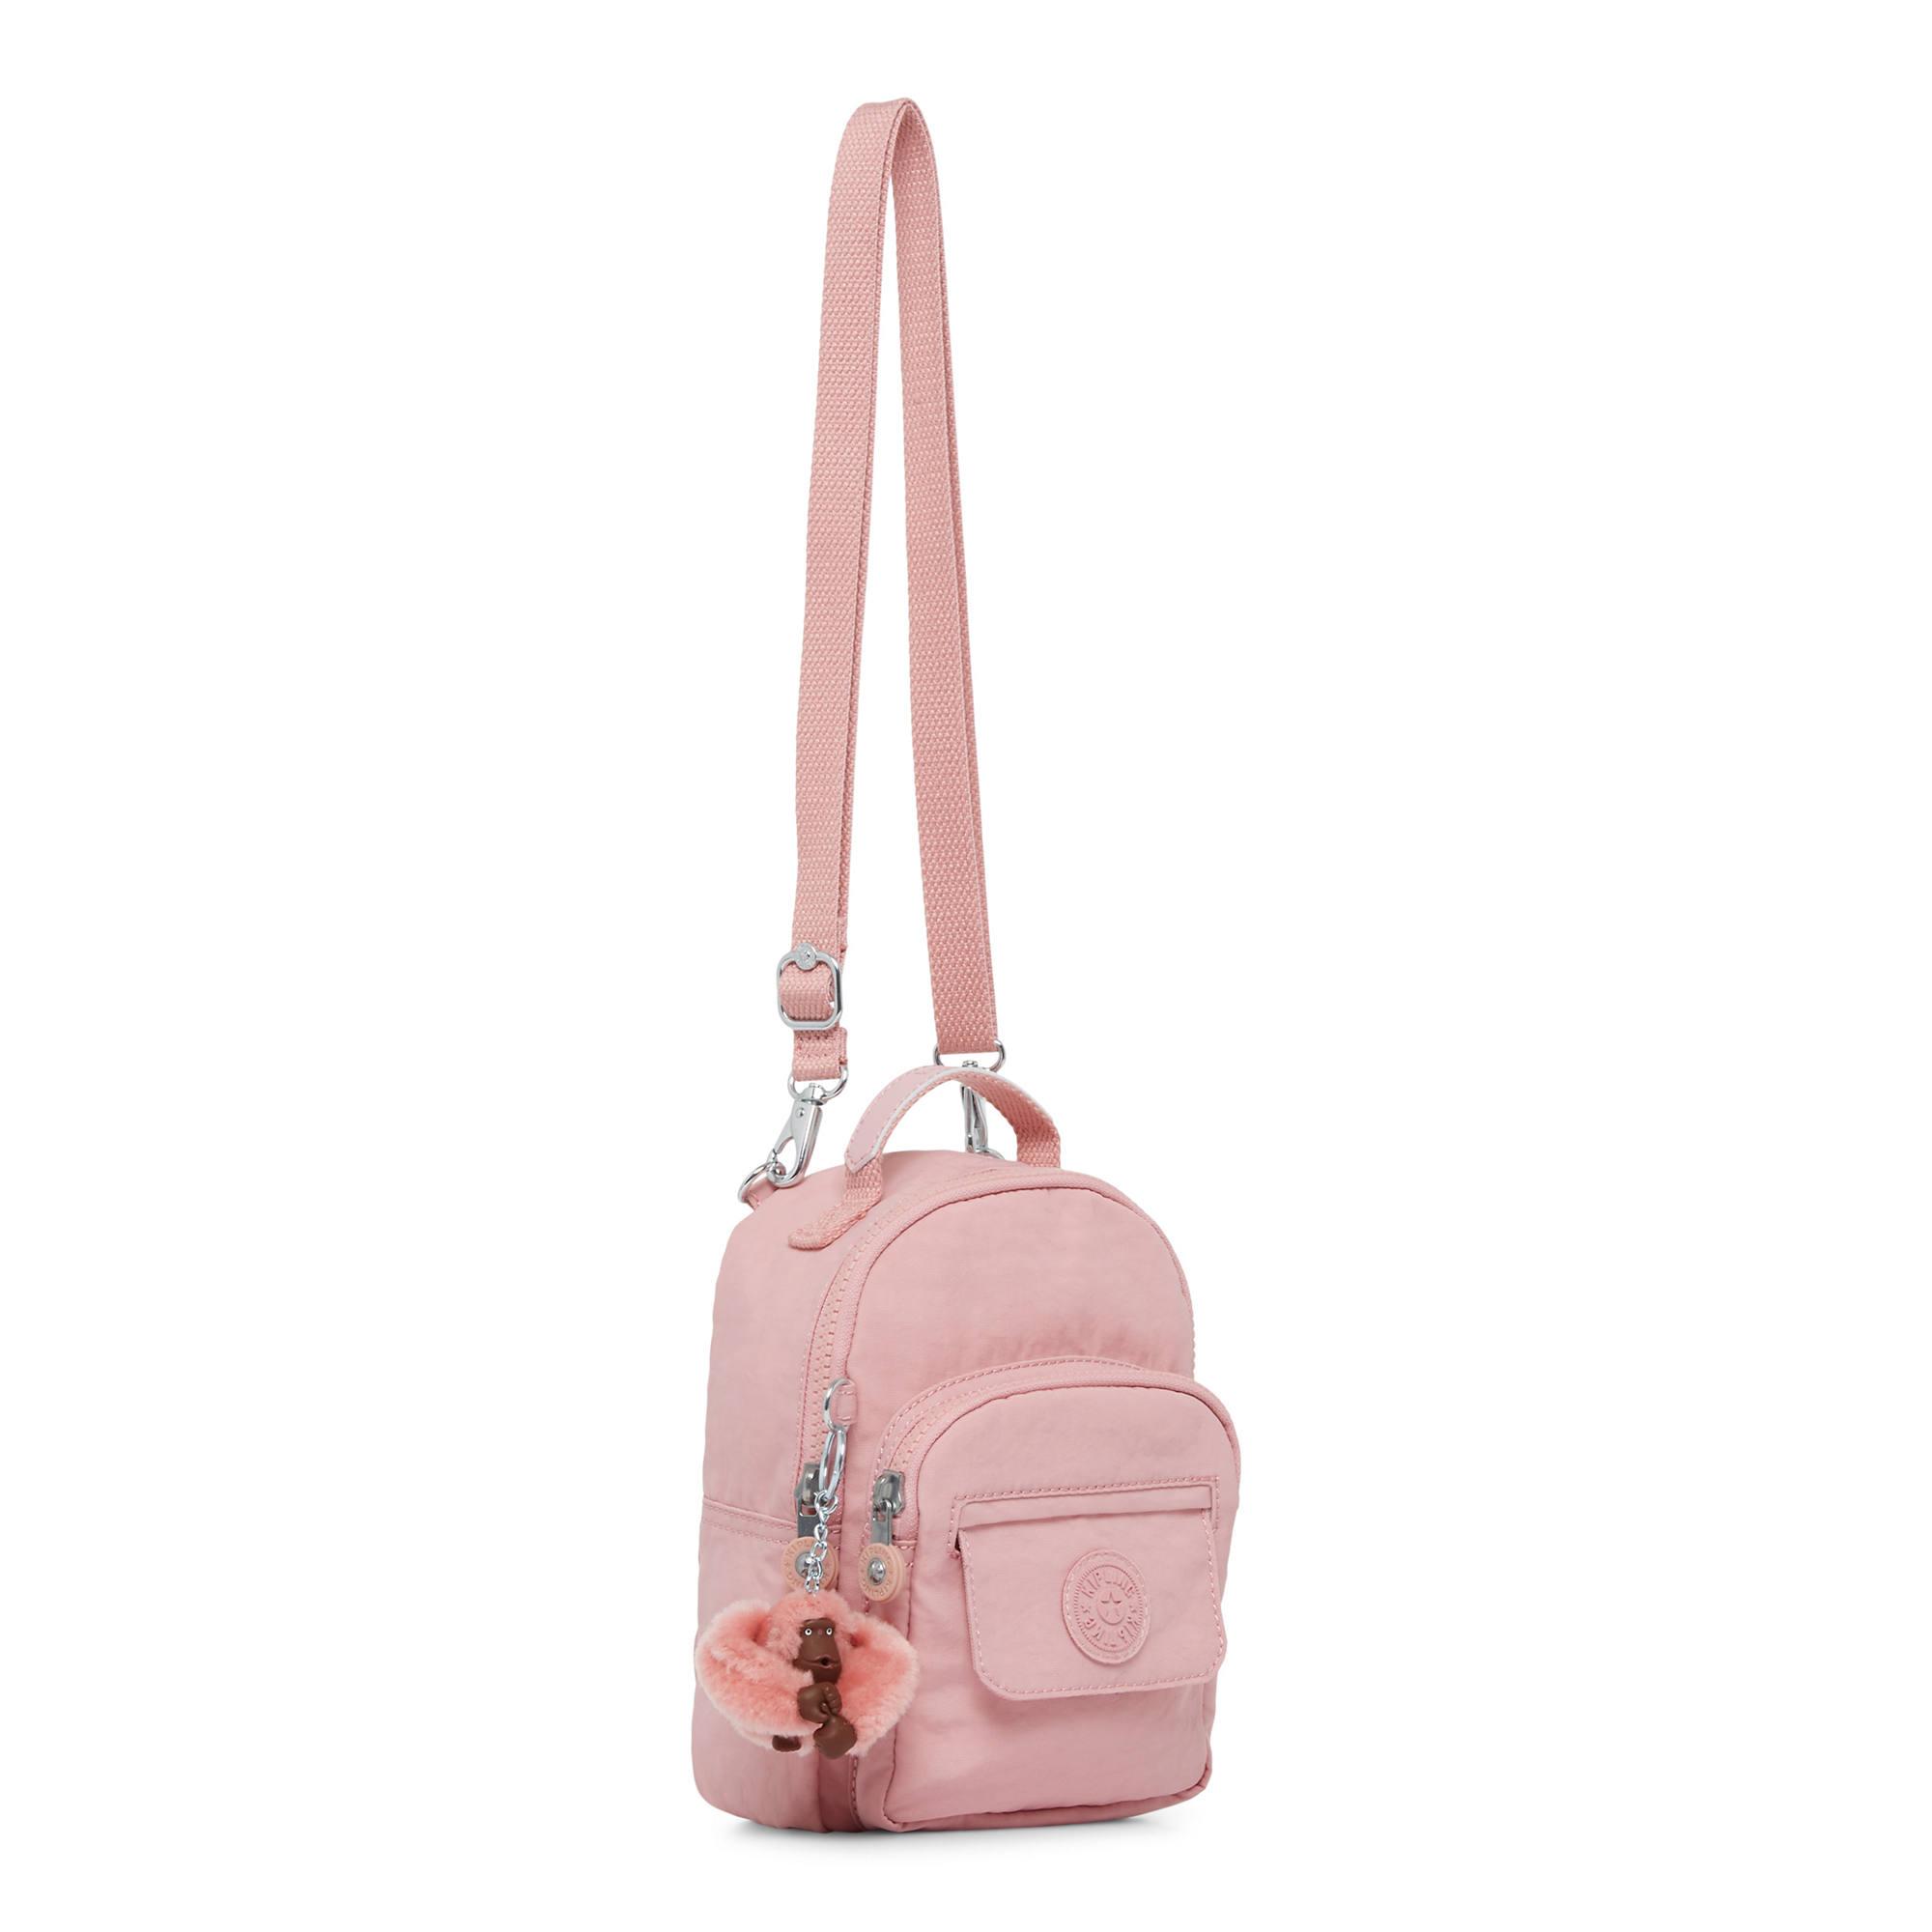 d03aab50ff Kipling Alber 3-In-1 Convertible Mini Bag Backpack